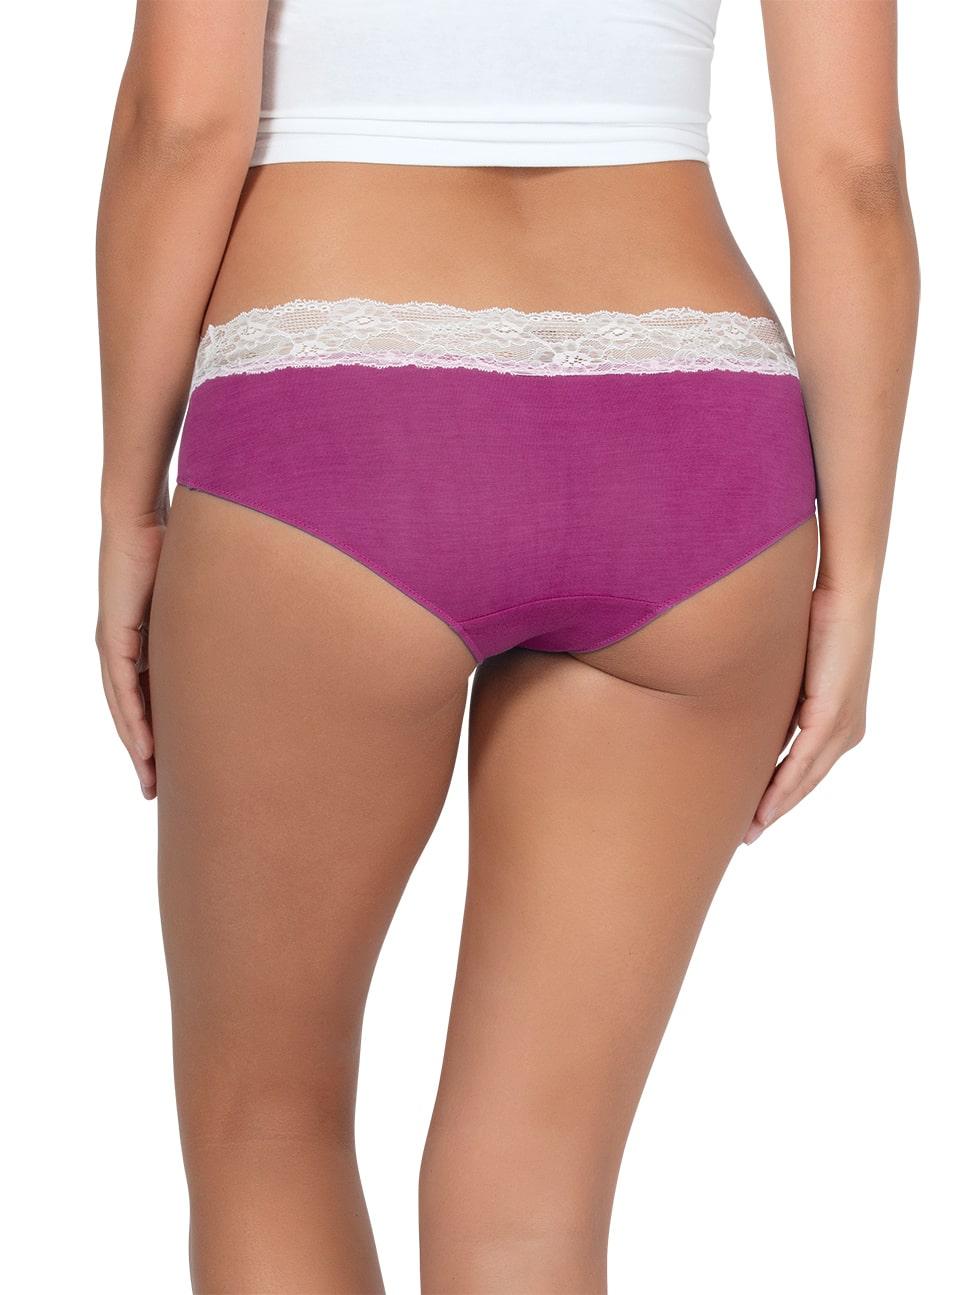 PARFAIT ParfaitPanty SoEssential HipsterPP503 WildPinkIvory Back - Parfait Panty So Essential Hipster - Wild Pink- PP503